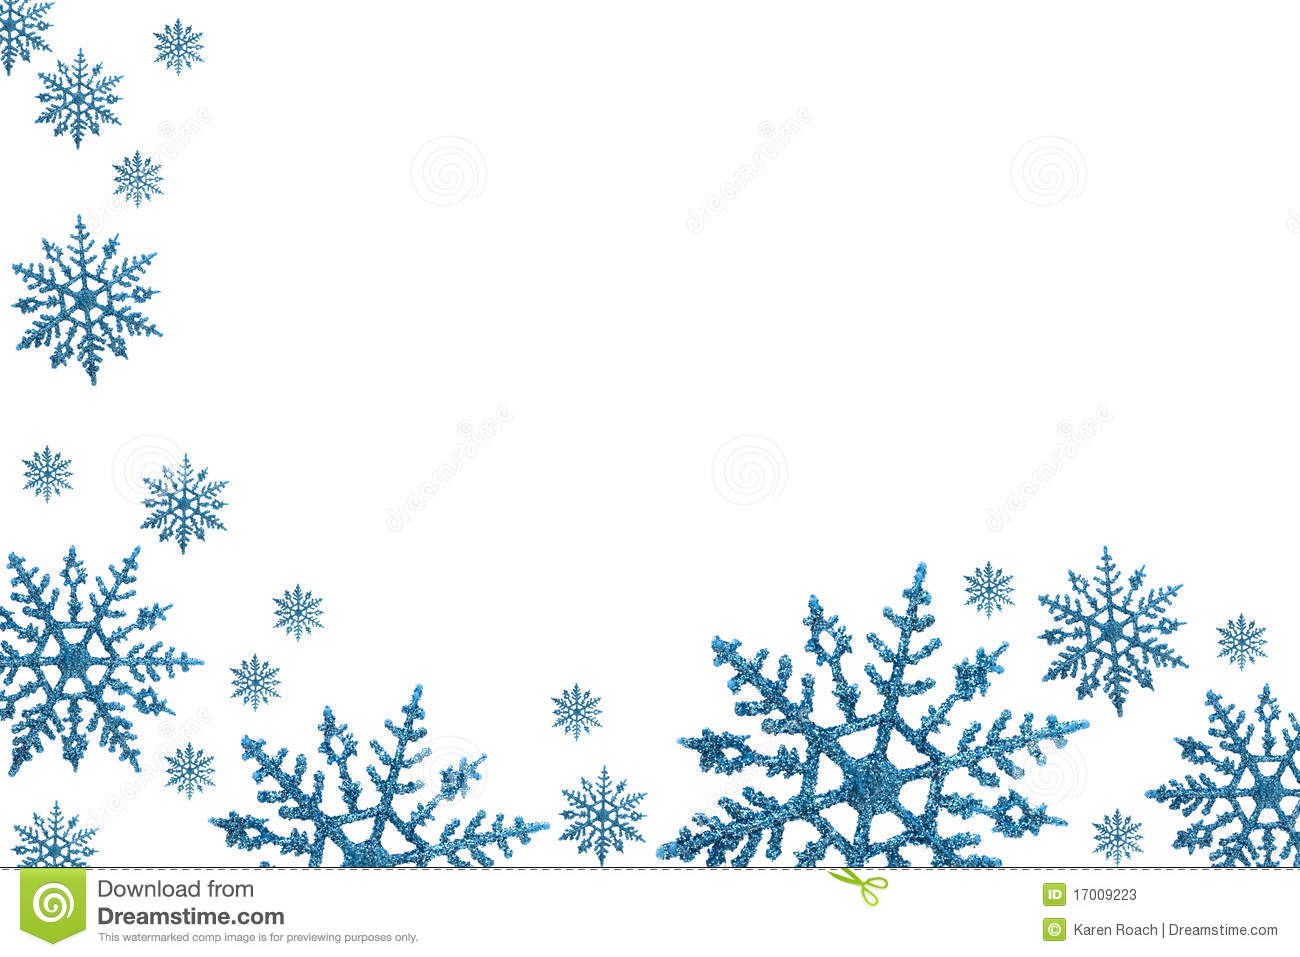 Winter Border Clipart Winter  - Free Snowflake Border Clipart